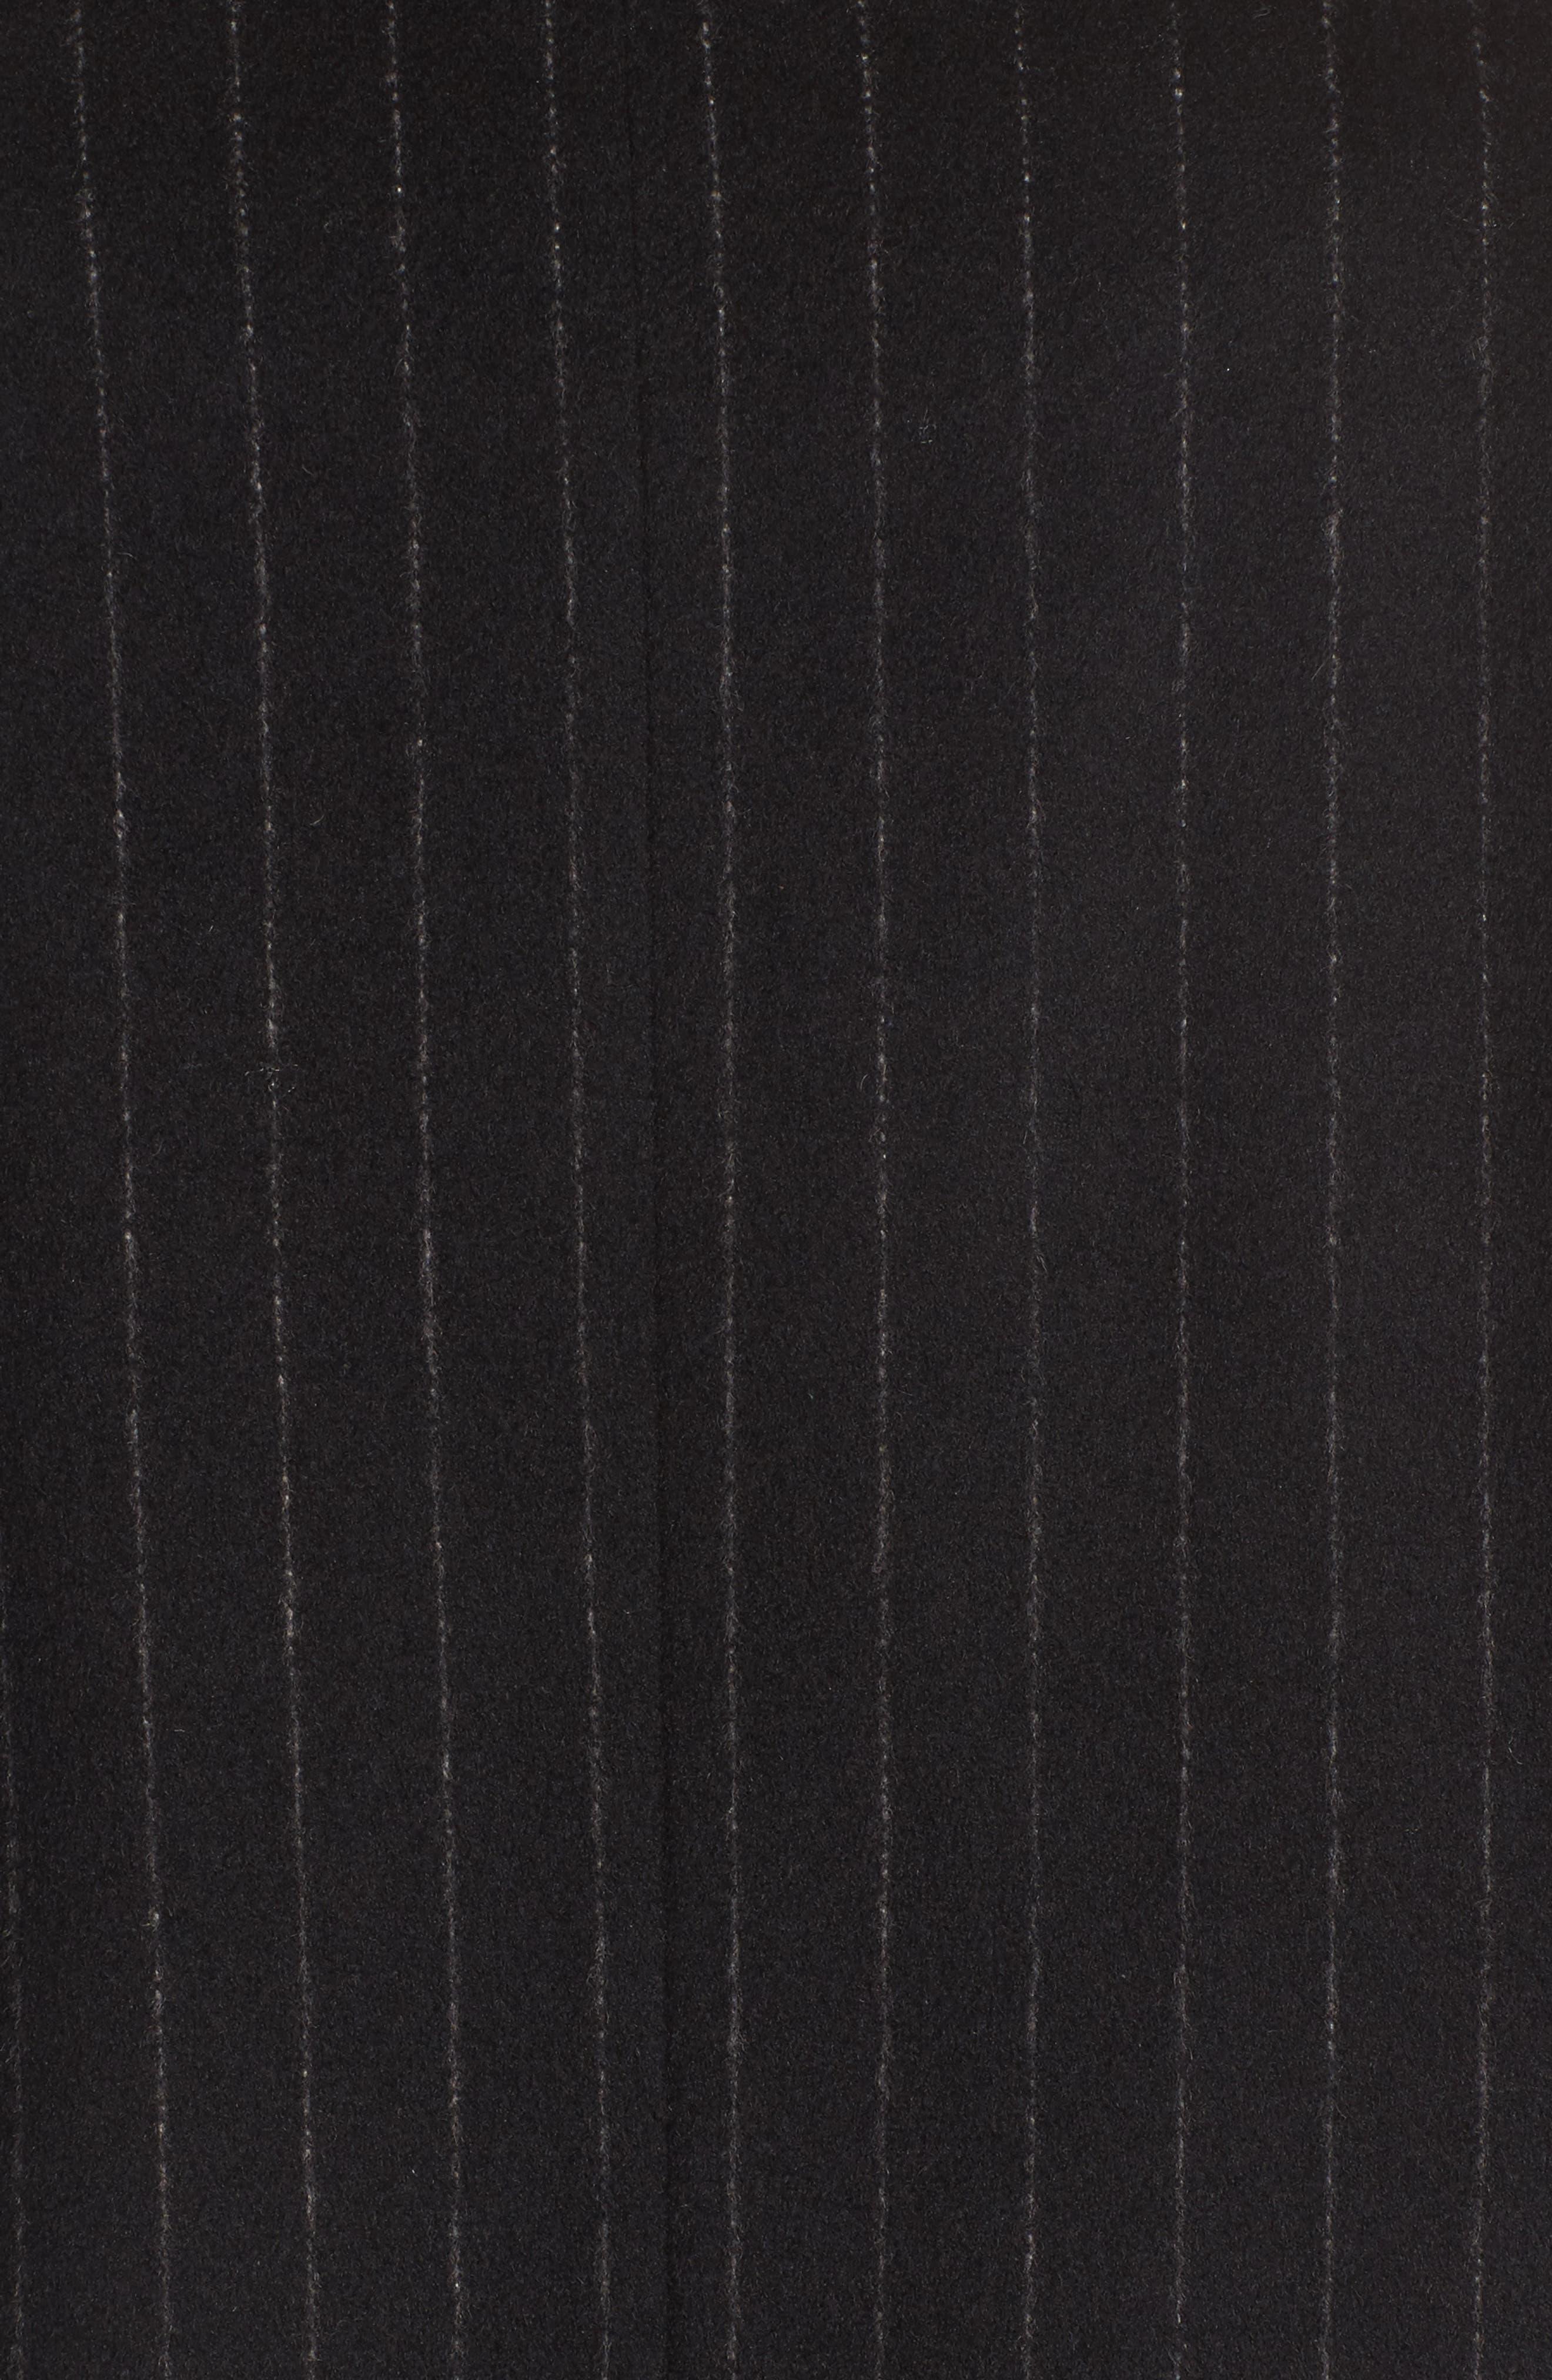 DKNY Pinstripe Wool Blend Coat,                             Alternate thumbnail 5, color,                             Black